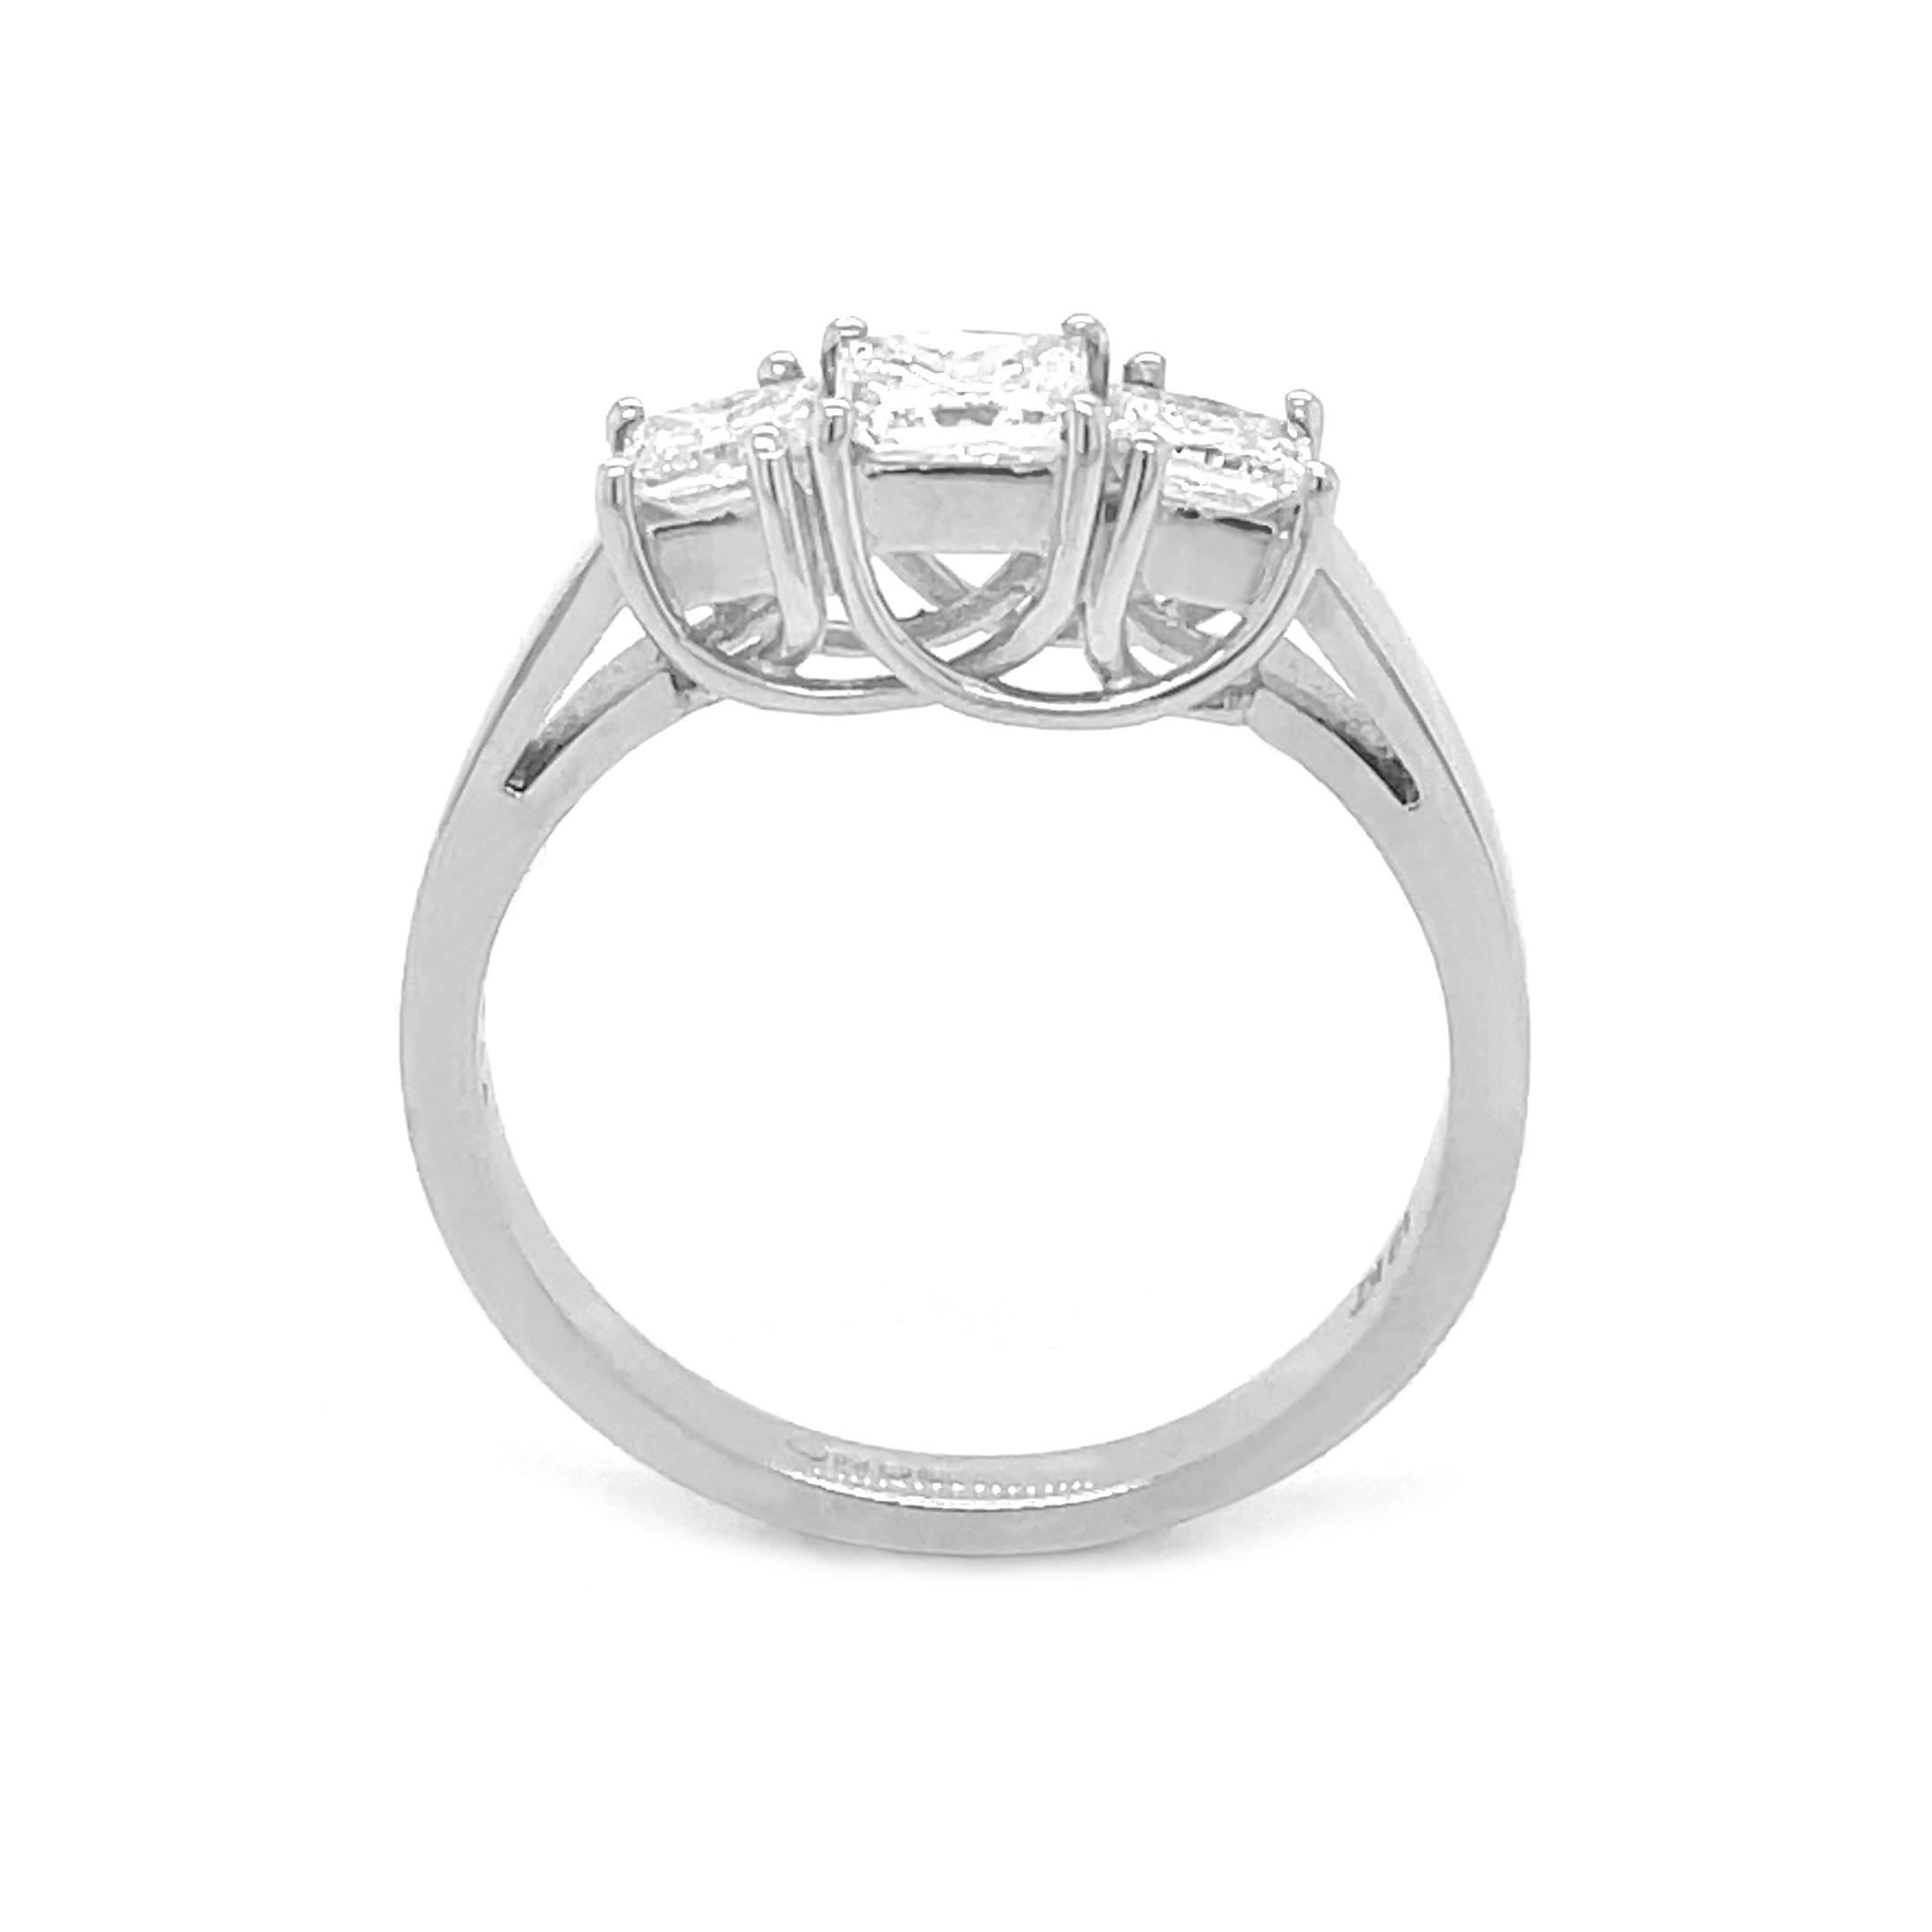 18k White Gold 3 Stone Princess Cut Diamond Ring